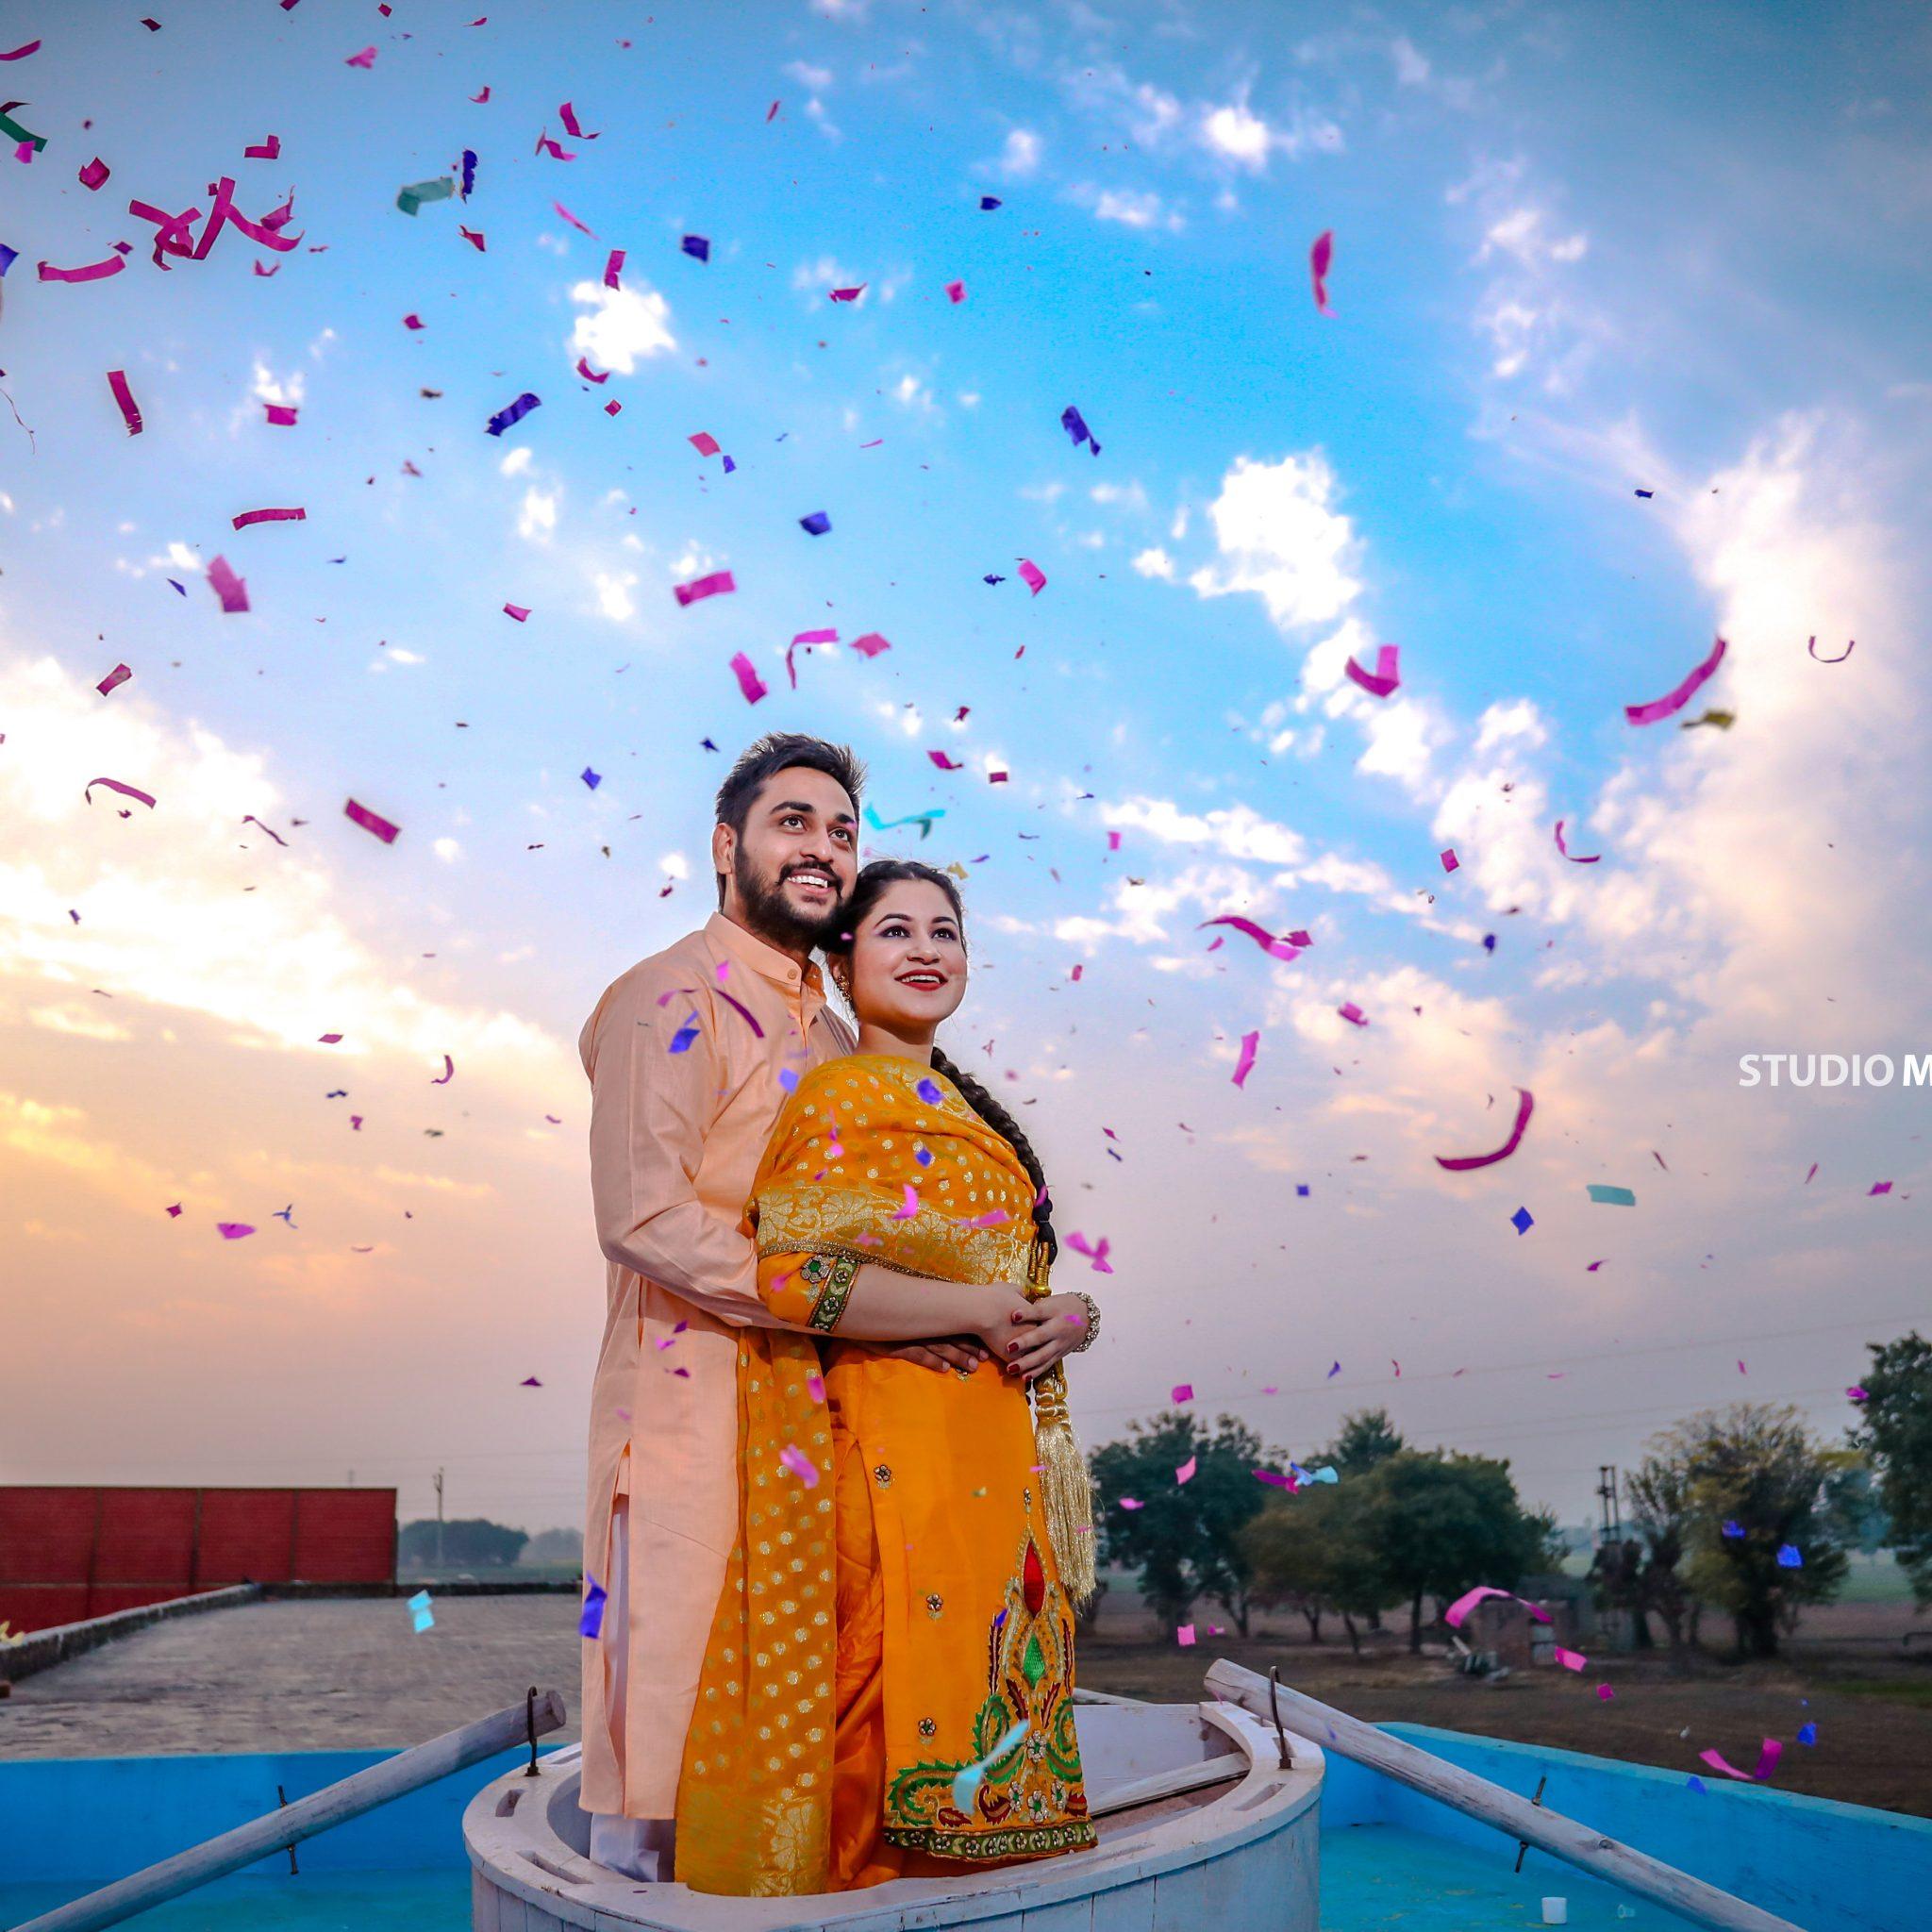 Lets celebrate equality – Pre wedding couple Navdeep & Navdeep